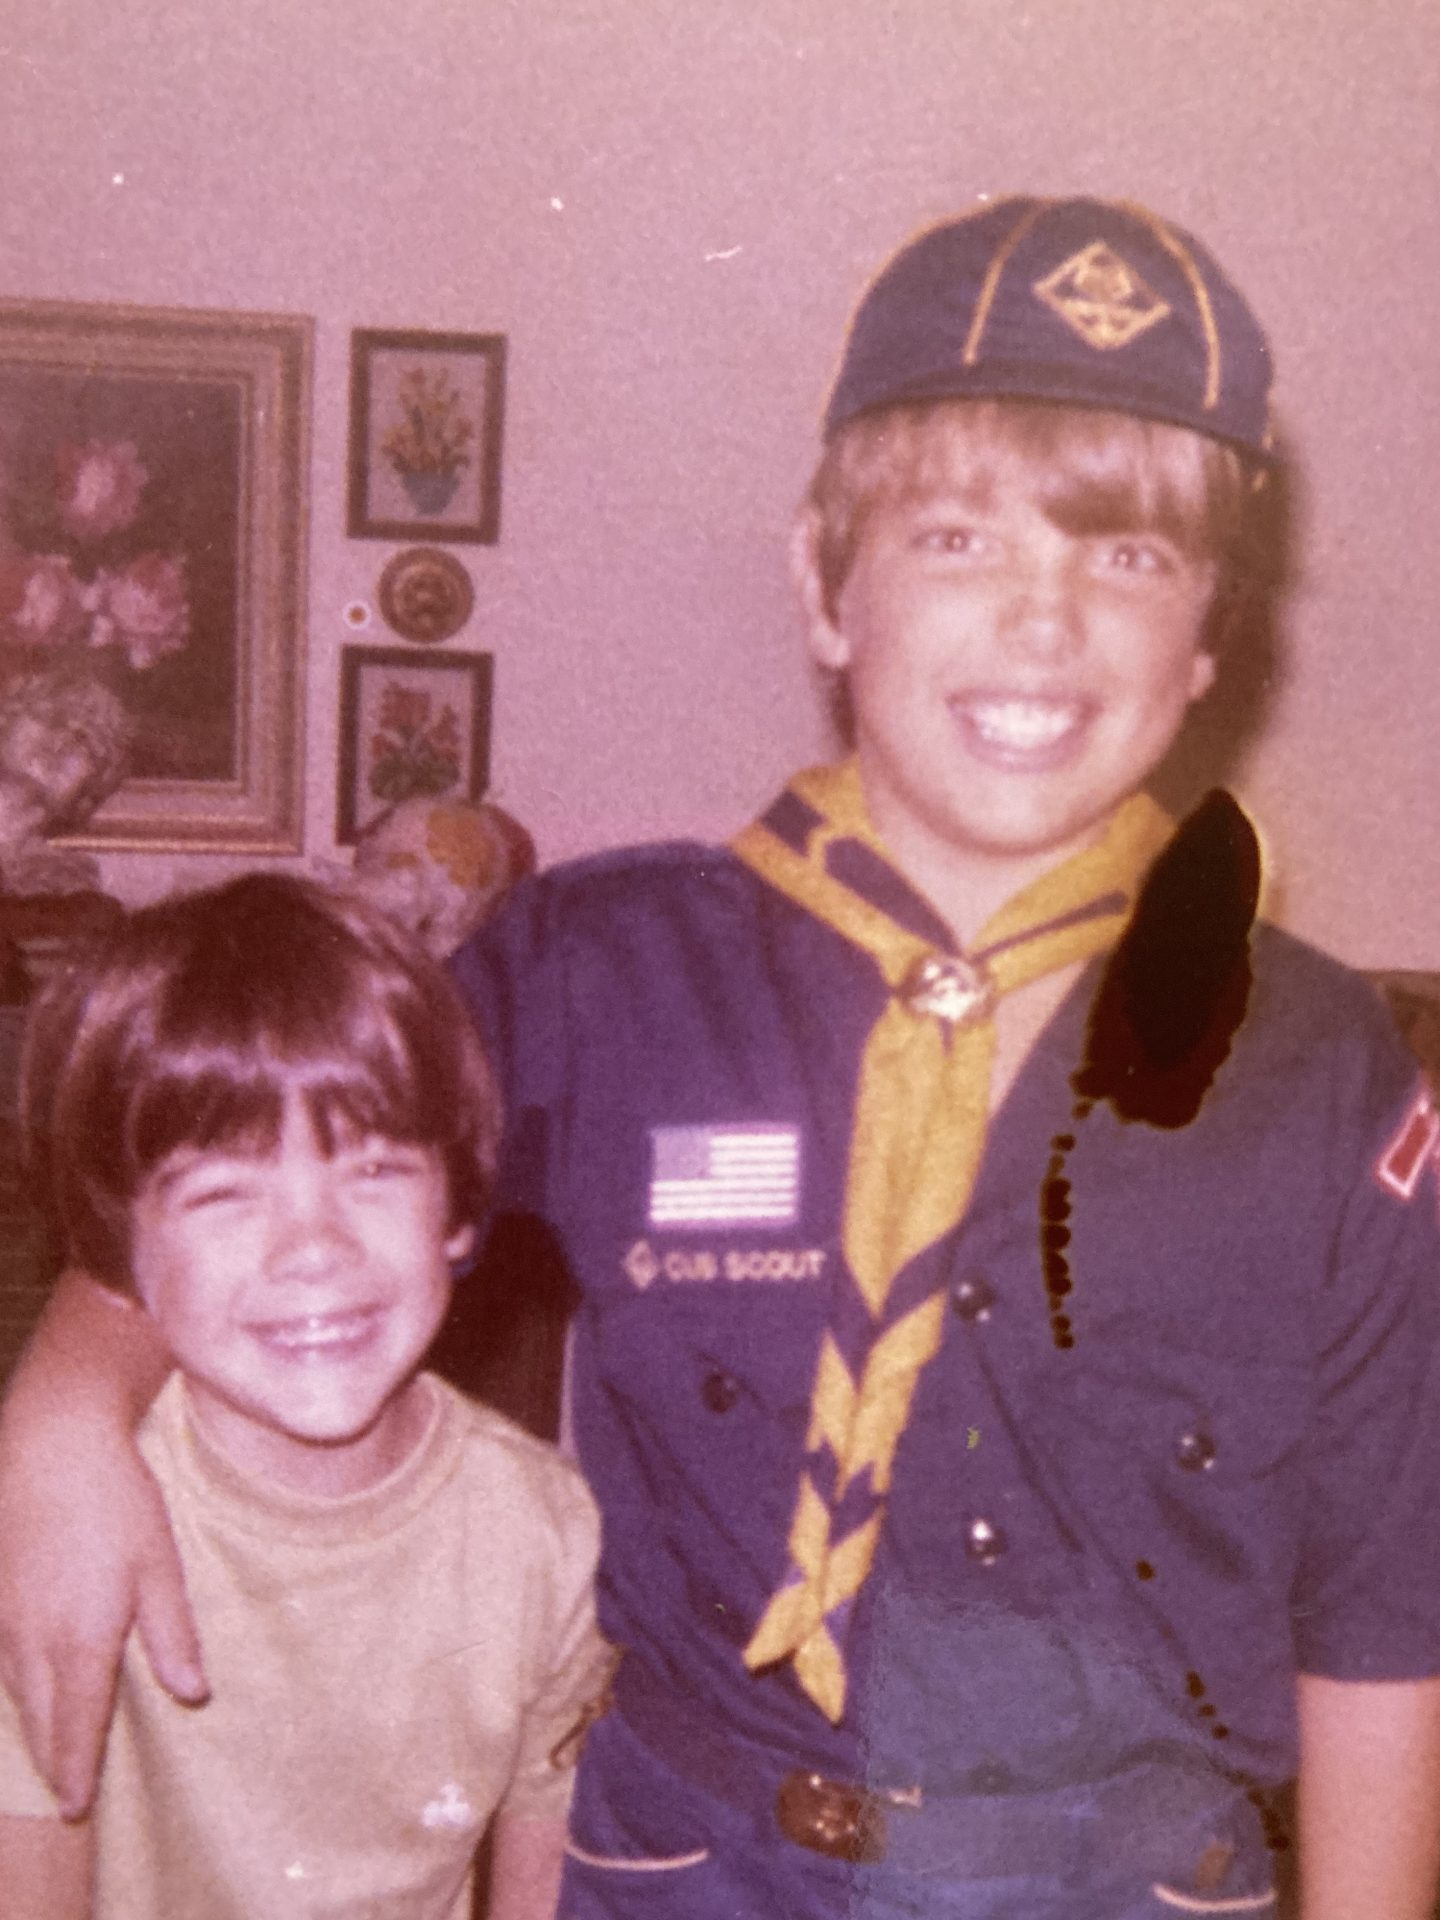 Cub Scout days.